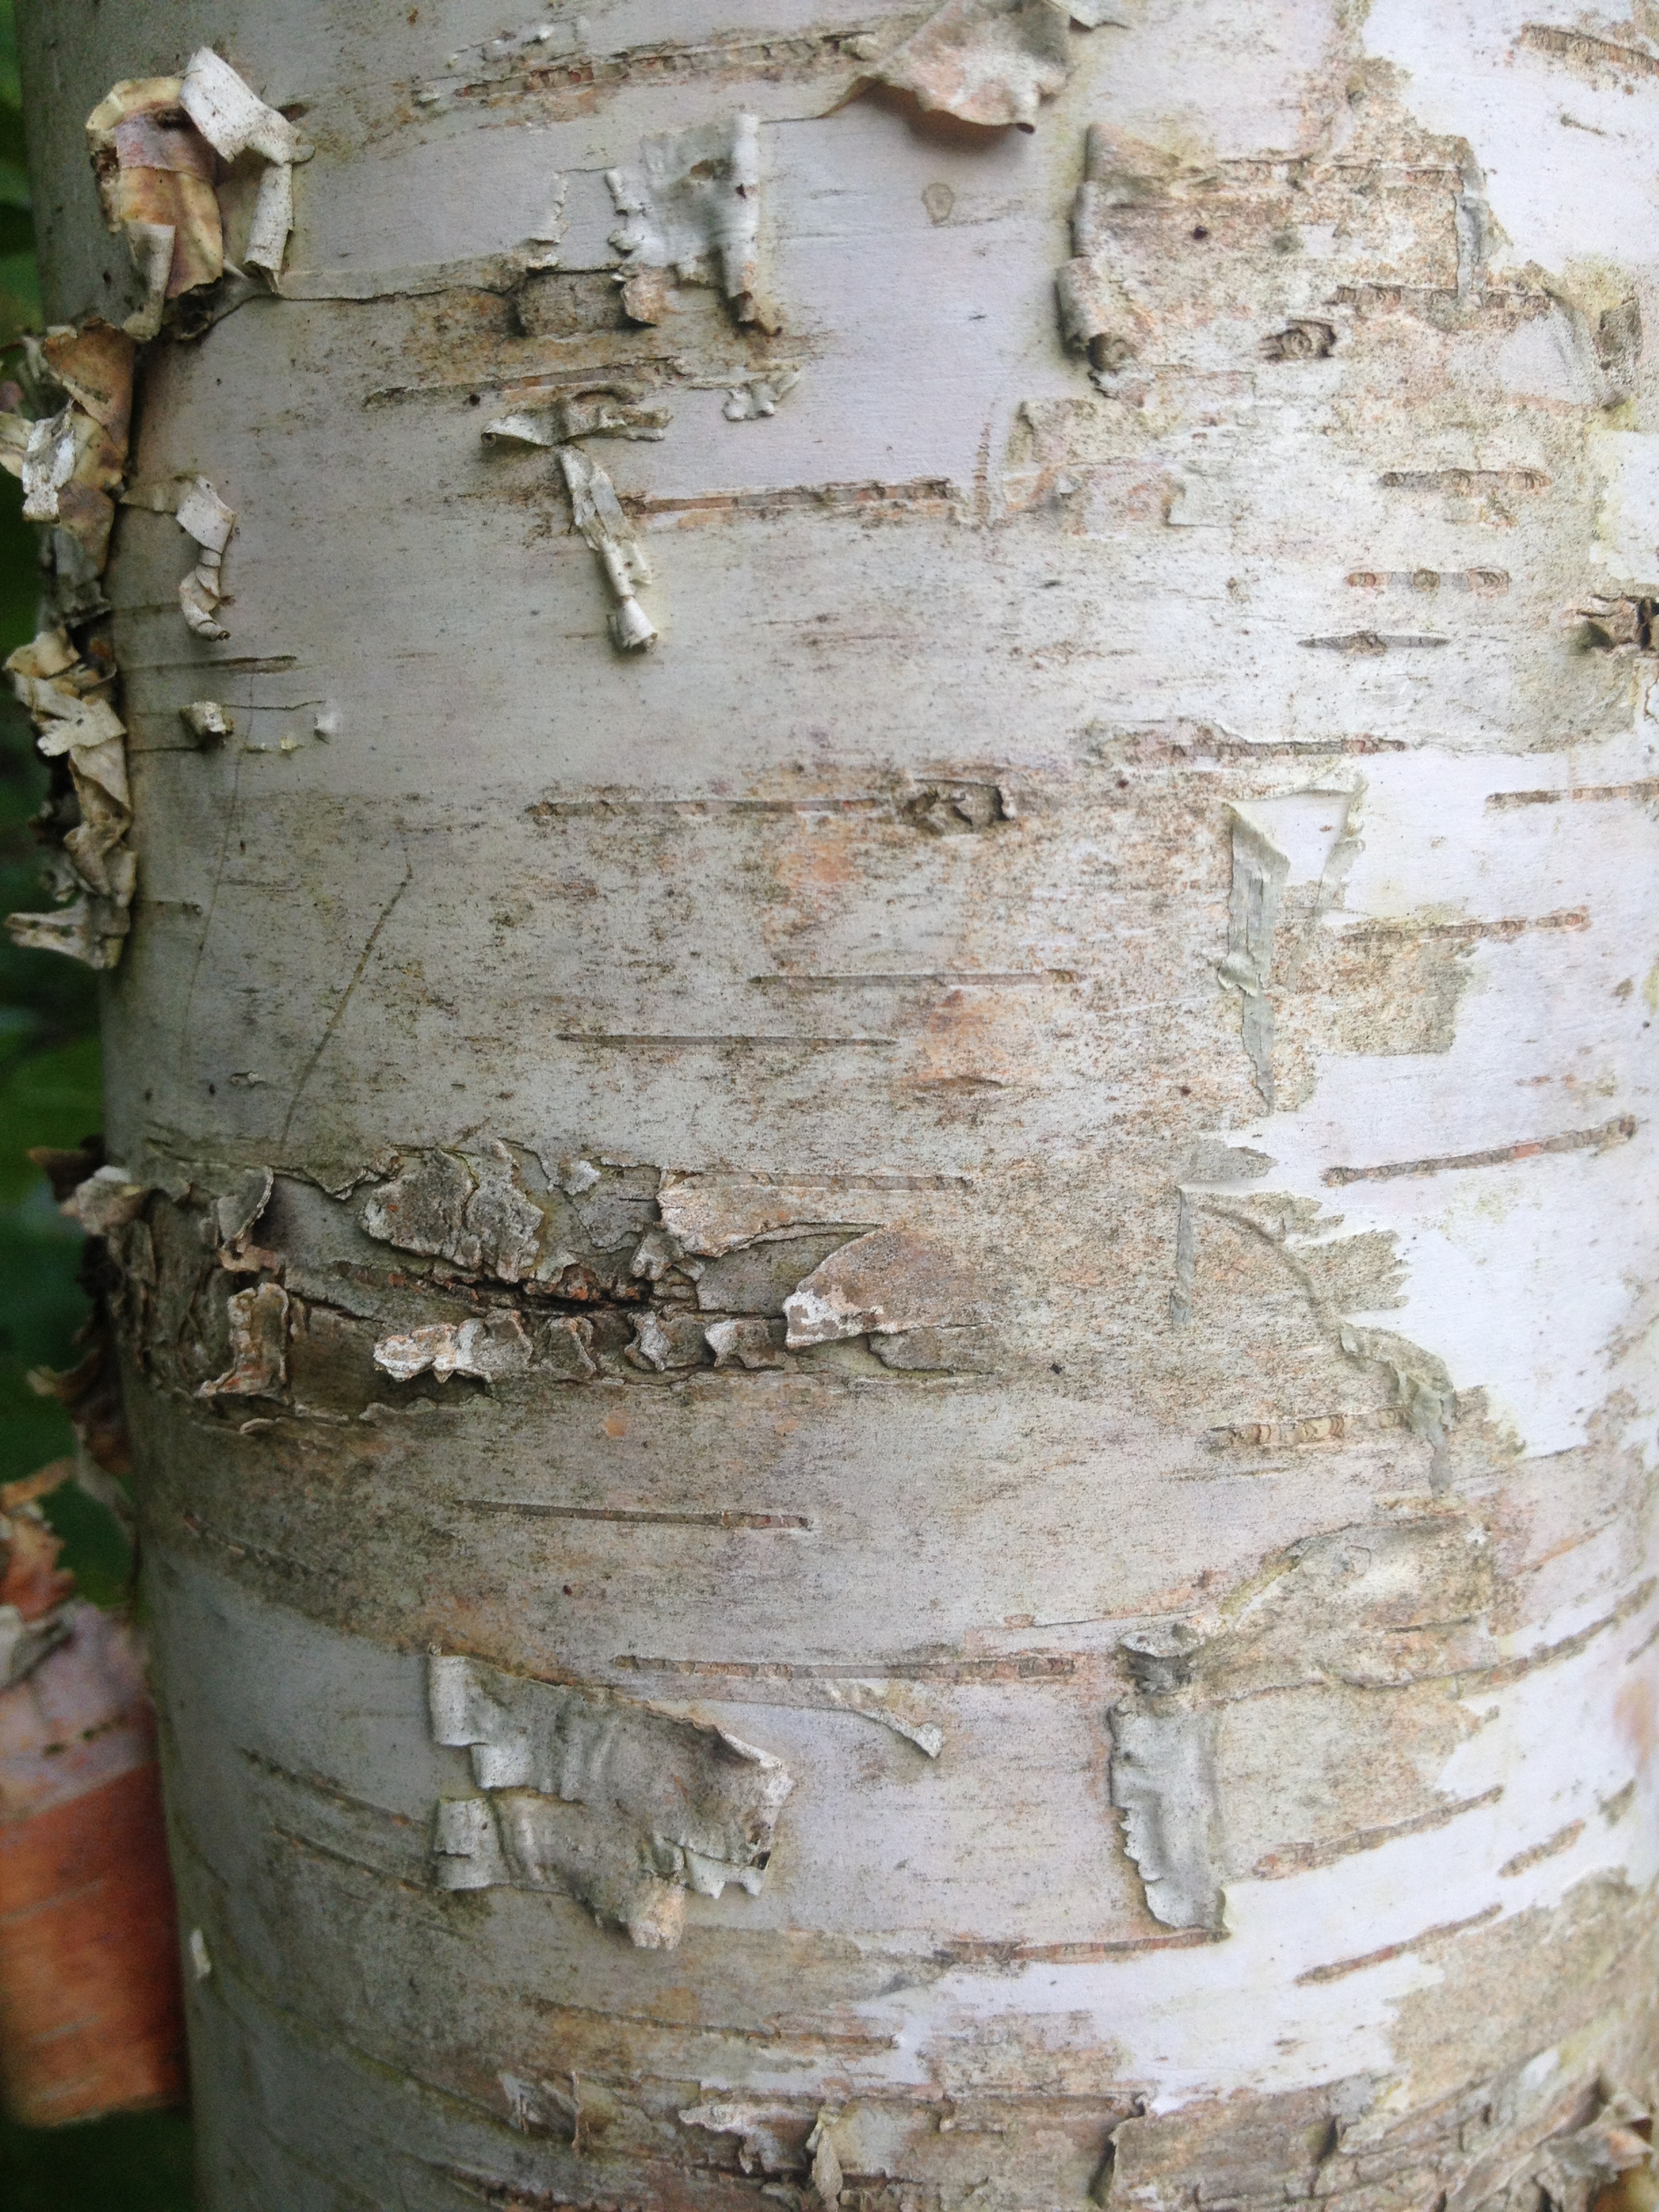 Birch tree trunk - closeup of bark